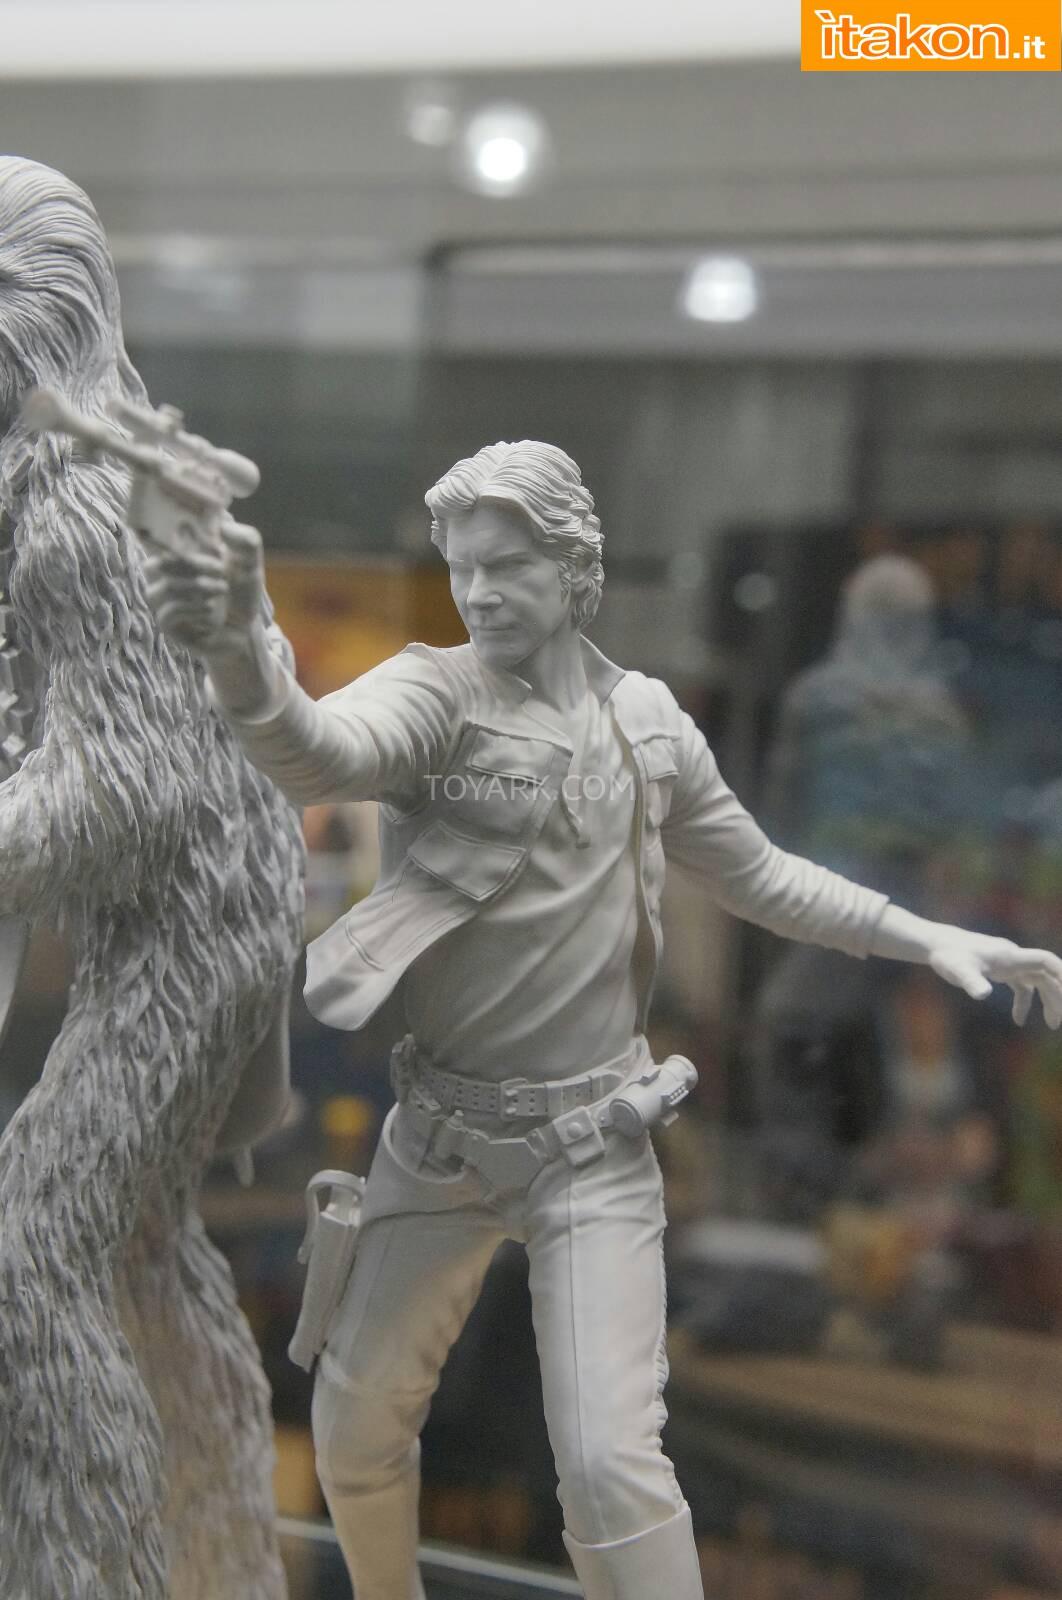 Link a Toy-Fair-2014-Kotobukiya-Star-Wars-019